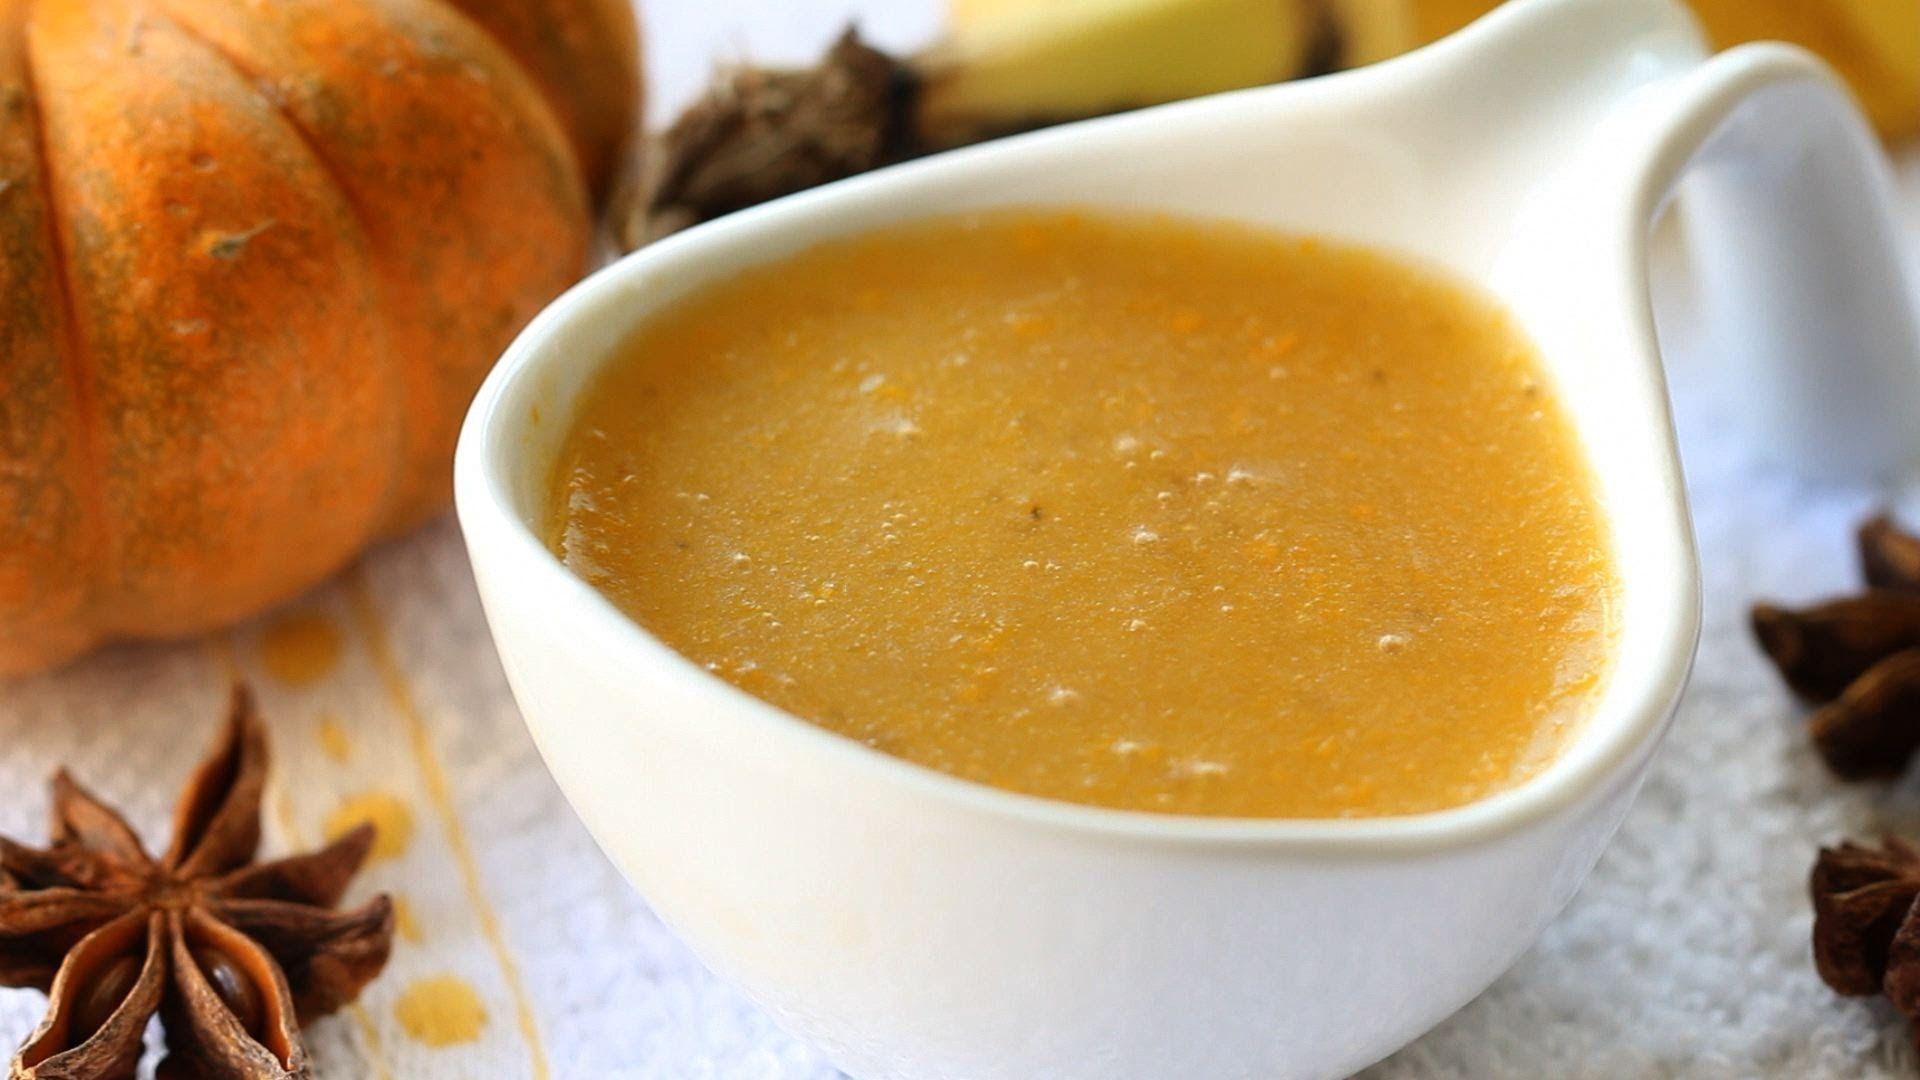 Baby food banana tapioca pumpkin pudding recipe with